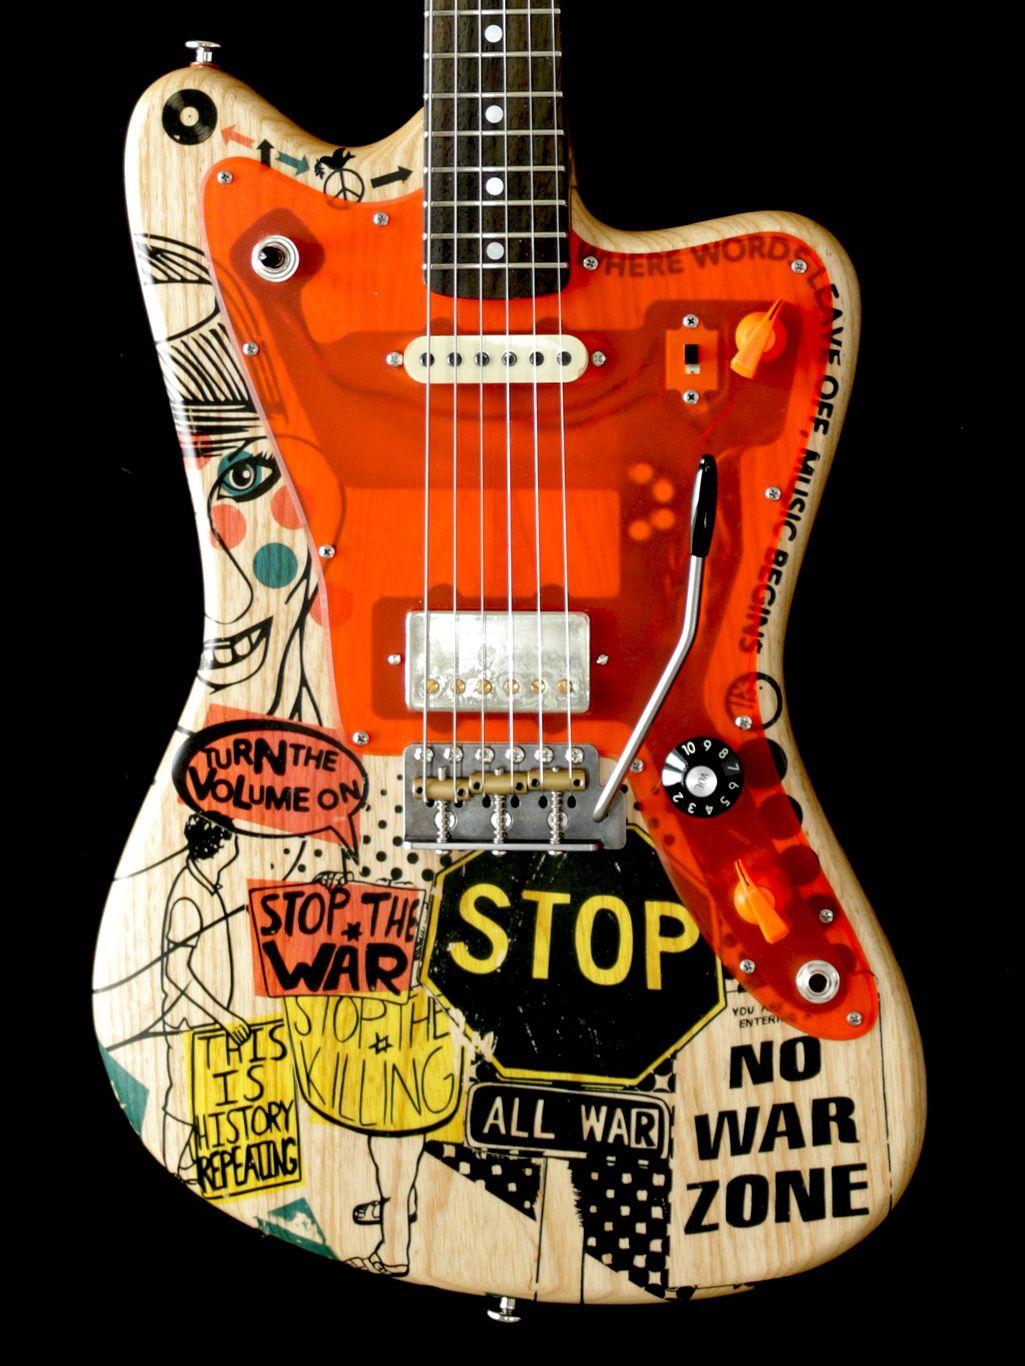 The Deimel Firestar Artist Edition Stop The War 2 Was Built By Kora Frank In 2016 And It Is A Tribu Custom Electric Guitars Custom Bass Guitar Music Guitar